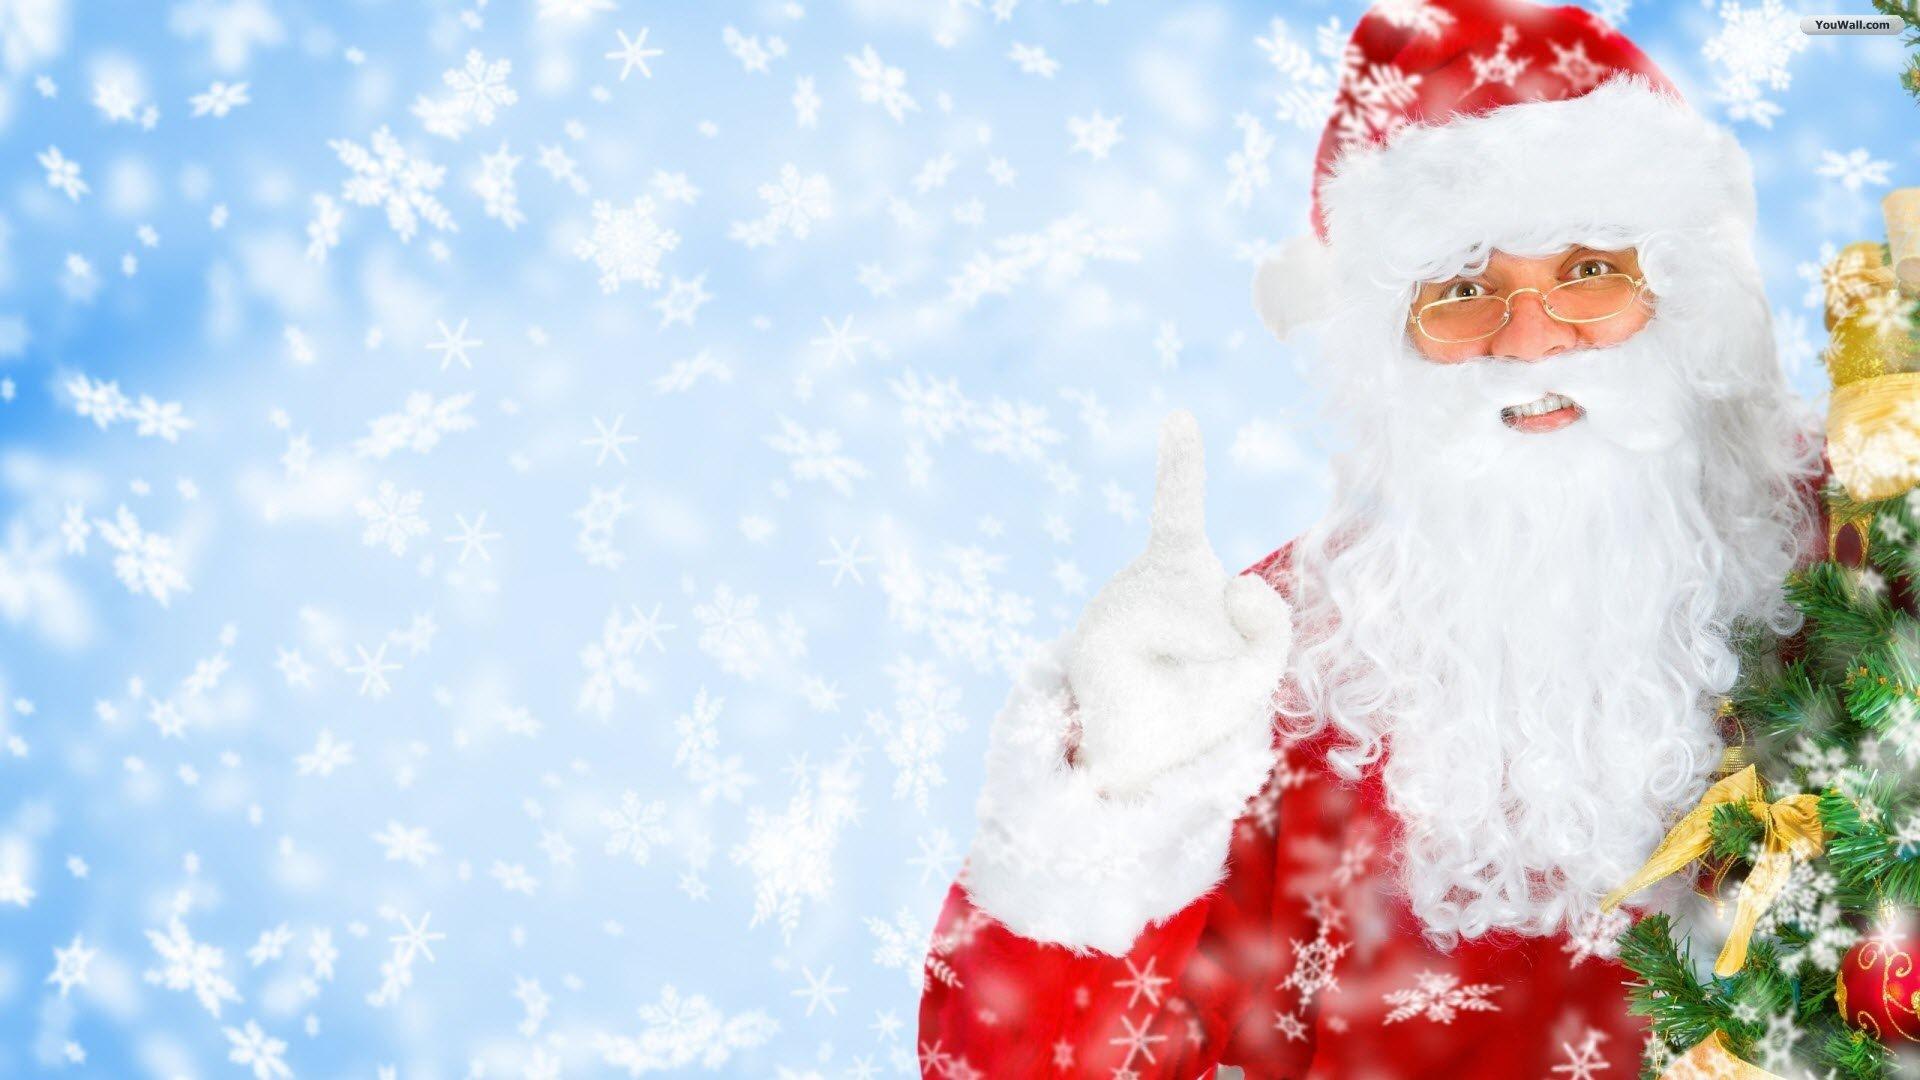 santa clause cartoon youwall claus free 202783 wallpaper wallpaper - Free Santa Pictures